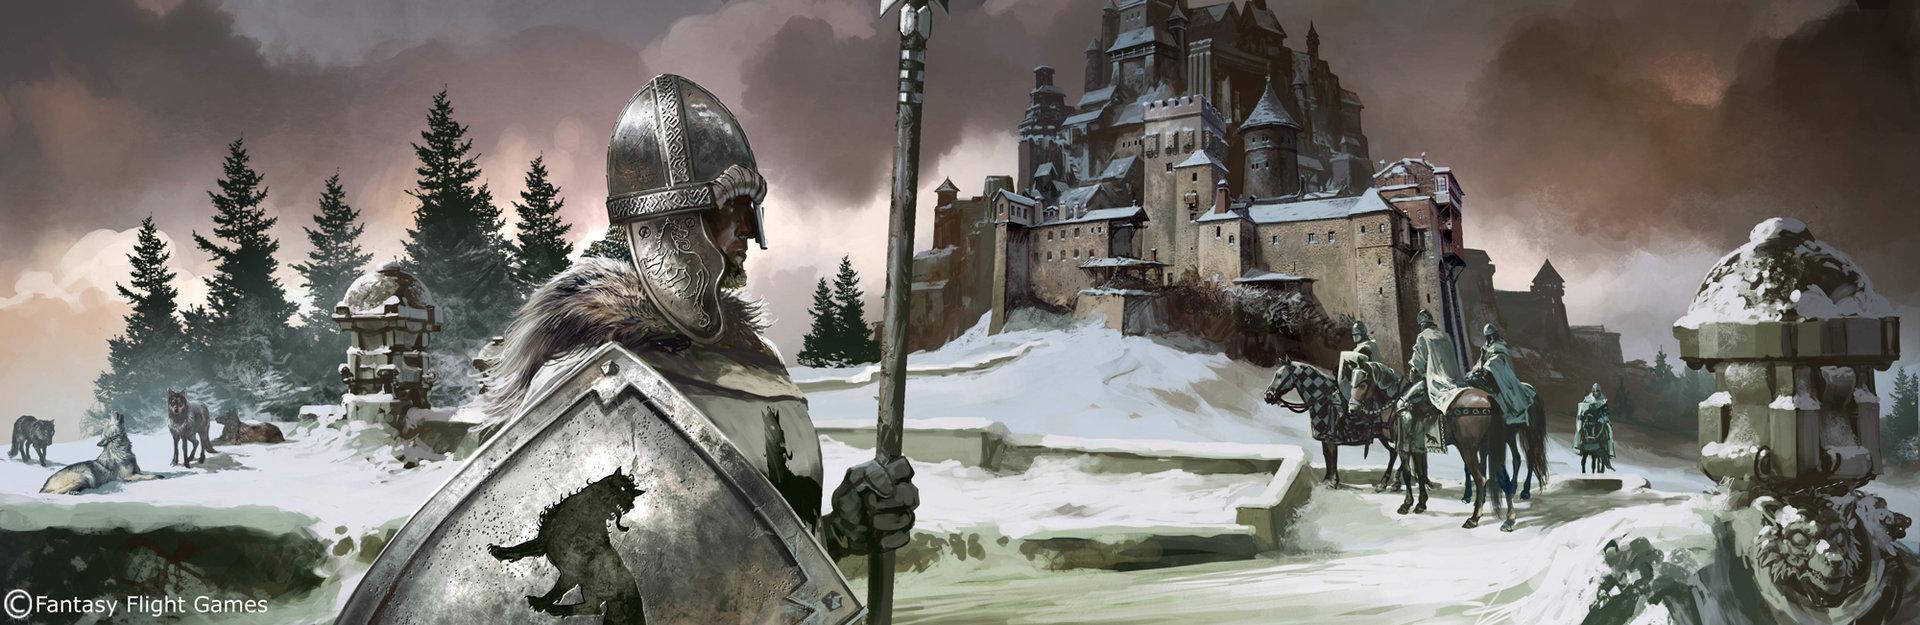 Ice Wolf 3d Wallpaper Artstation Game Of Thrones House Stark Tomasz Jedruszek